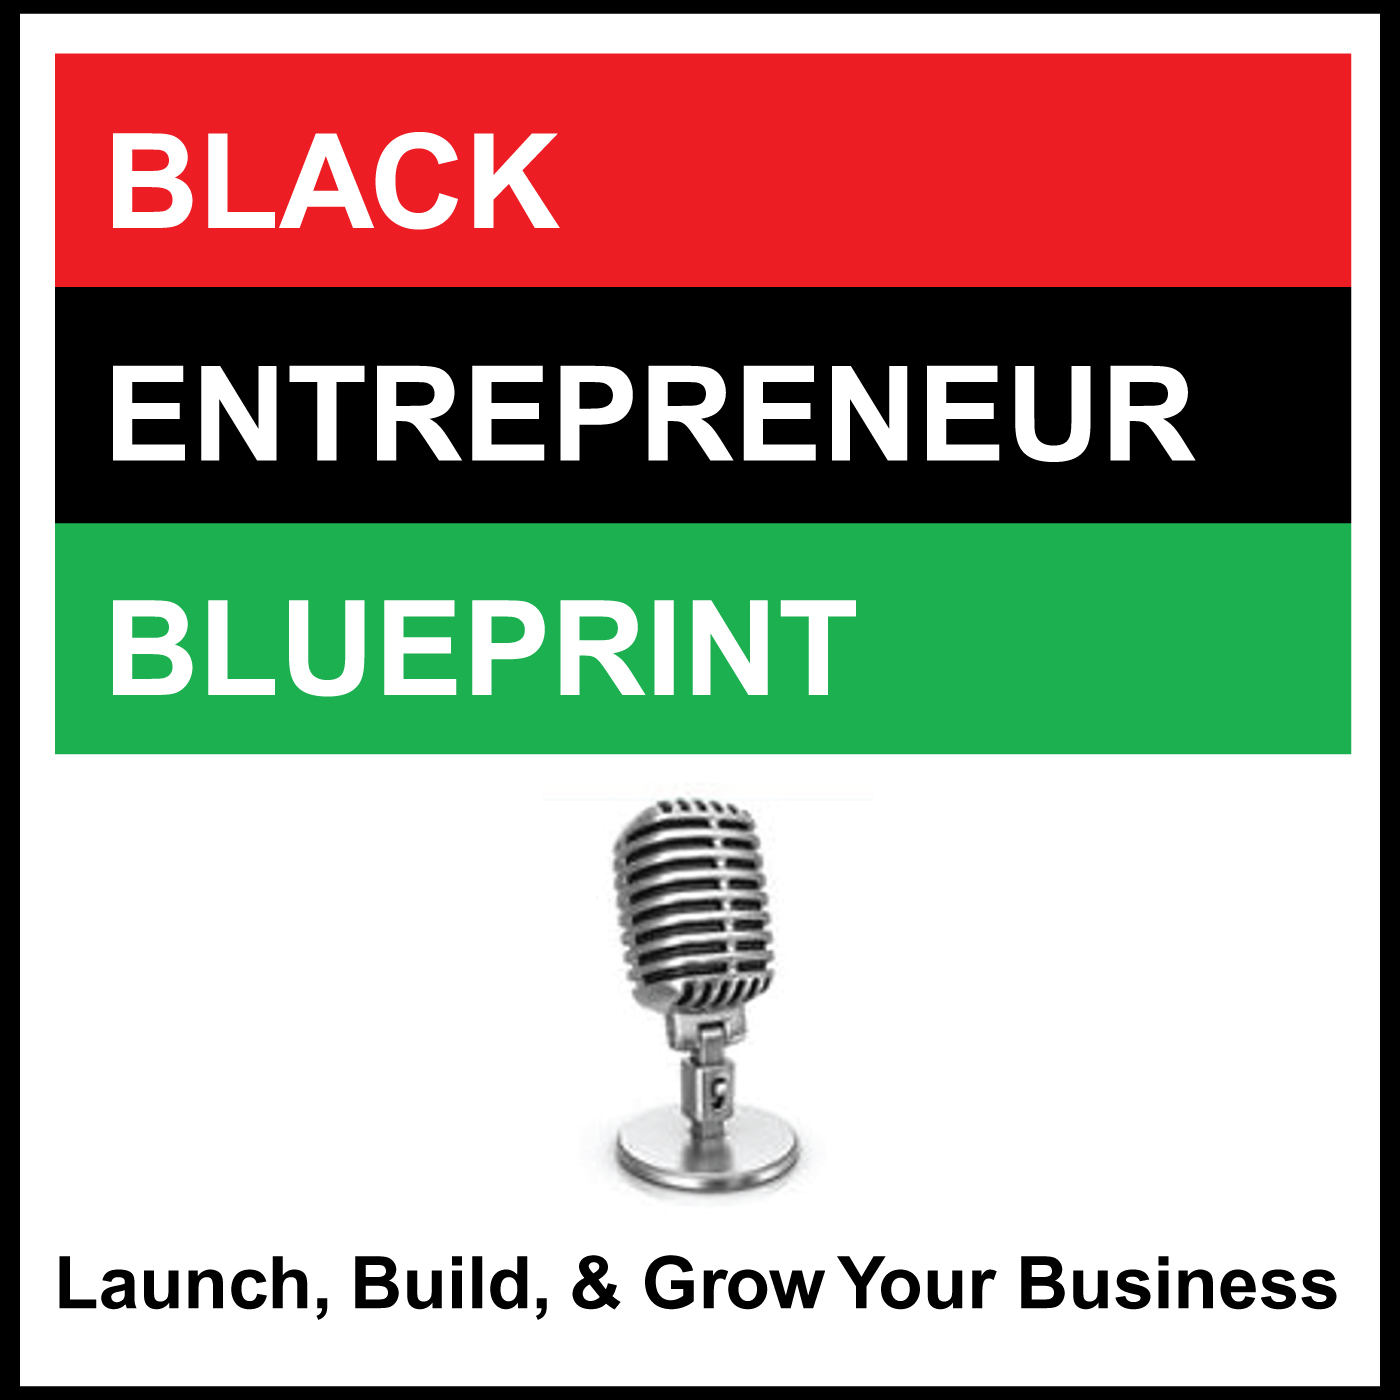 Black Entrepreneur Blueprint: 07 - Diane Da Costa